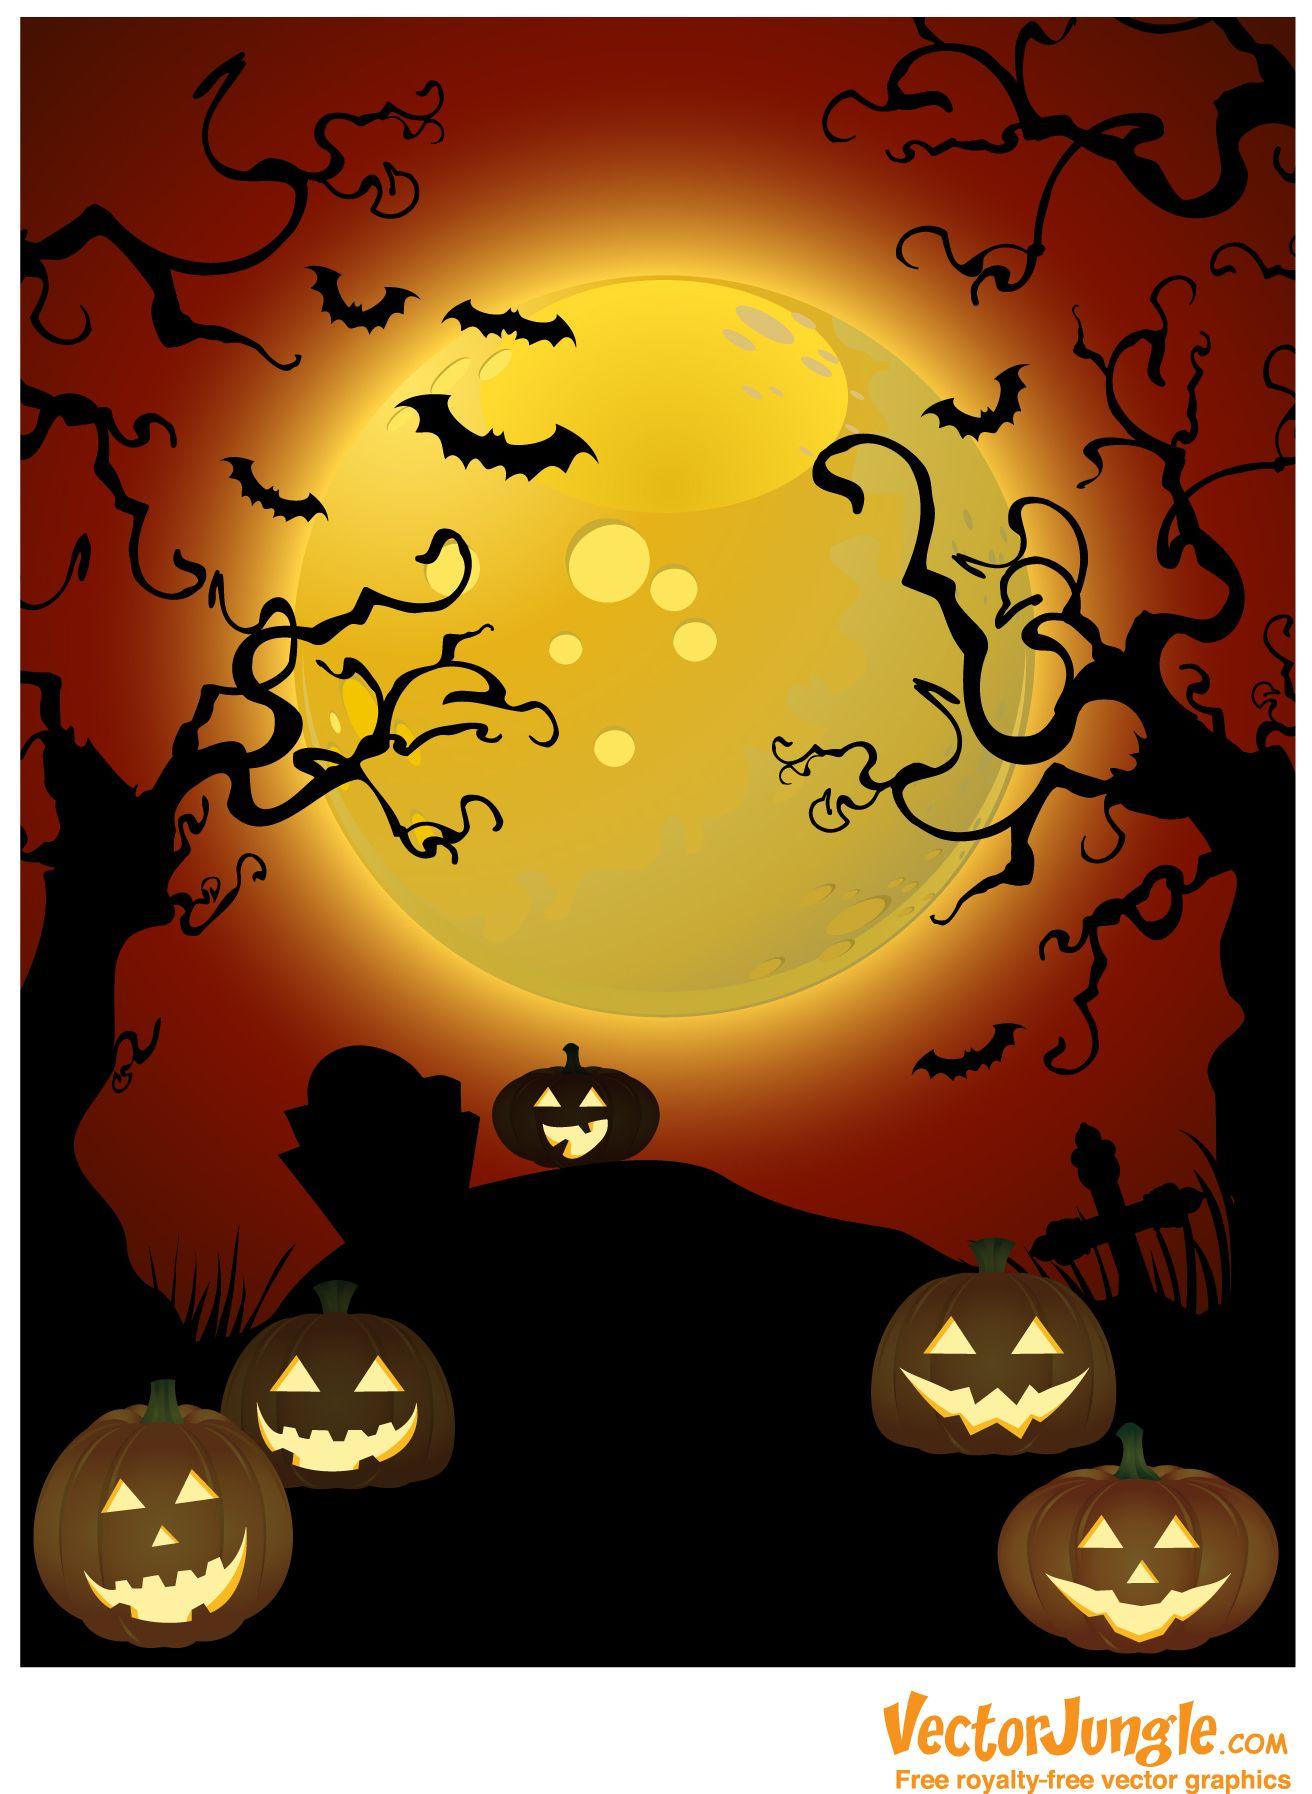 Free Halloween Photos to Share.